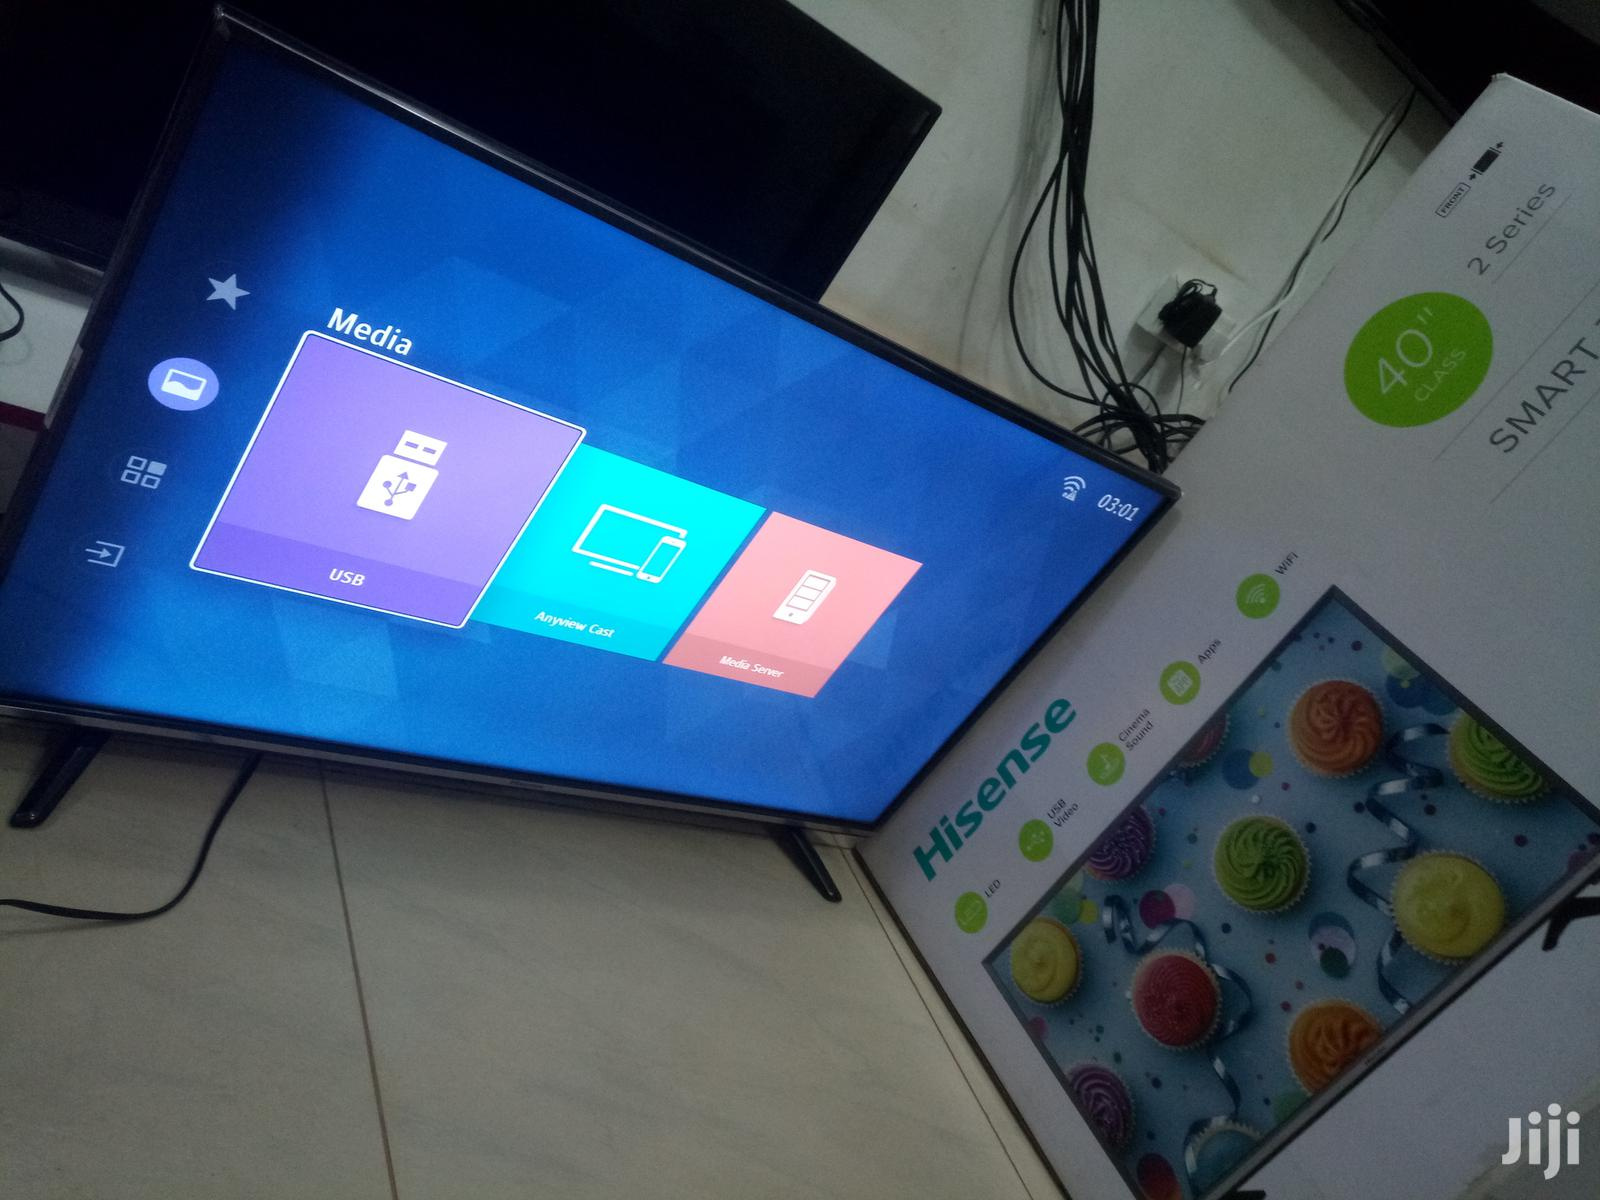 Hisense Smart Flat Screen Digital TV 40 Inches | TV & DVD Equipment for sale in Kampala, Central Region, Uganda